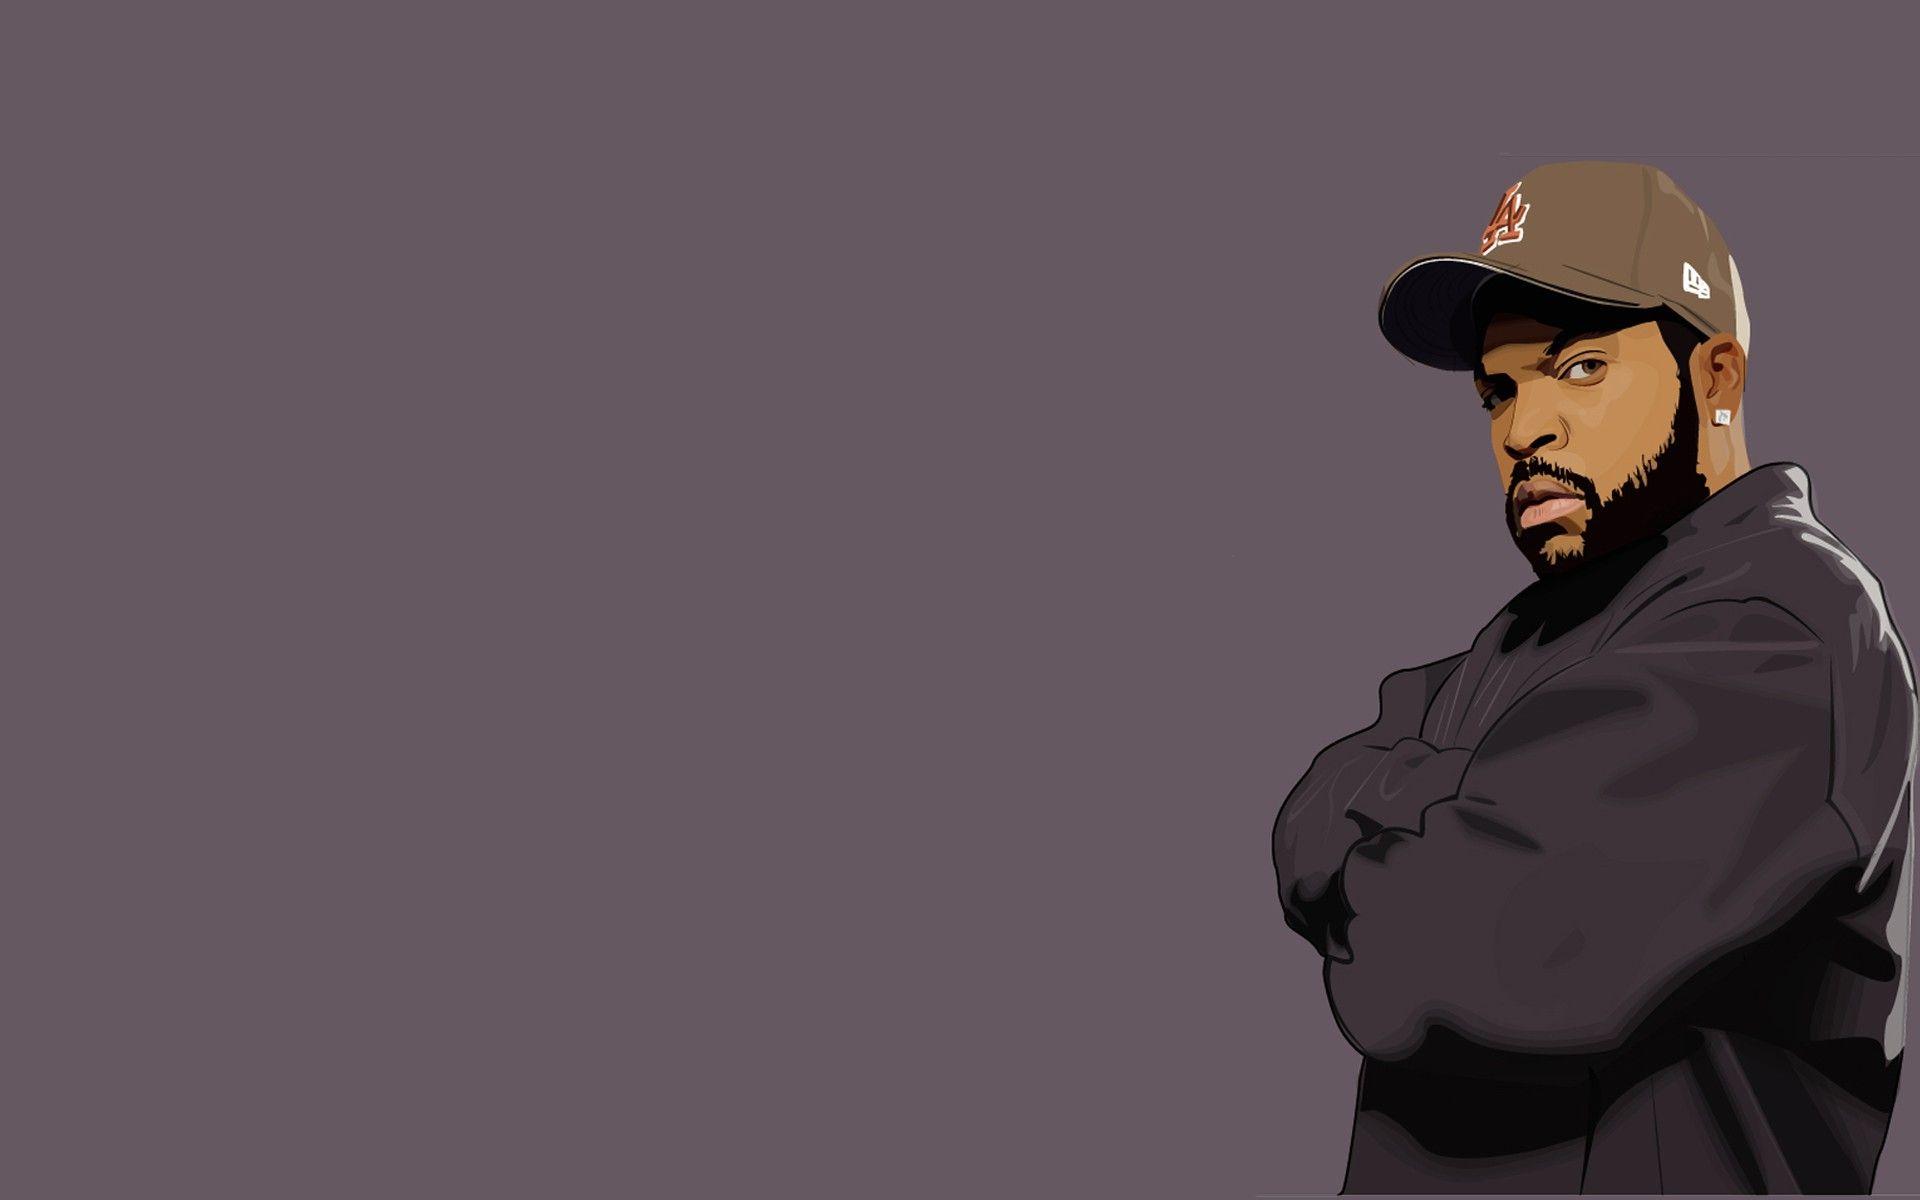 West Coast Og Ice Cube Rap Hip Hop Background